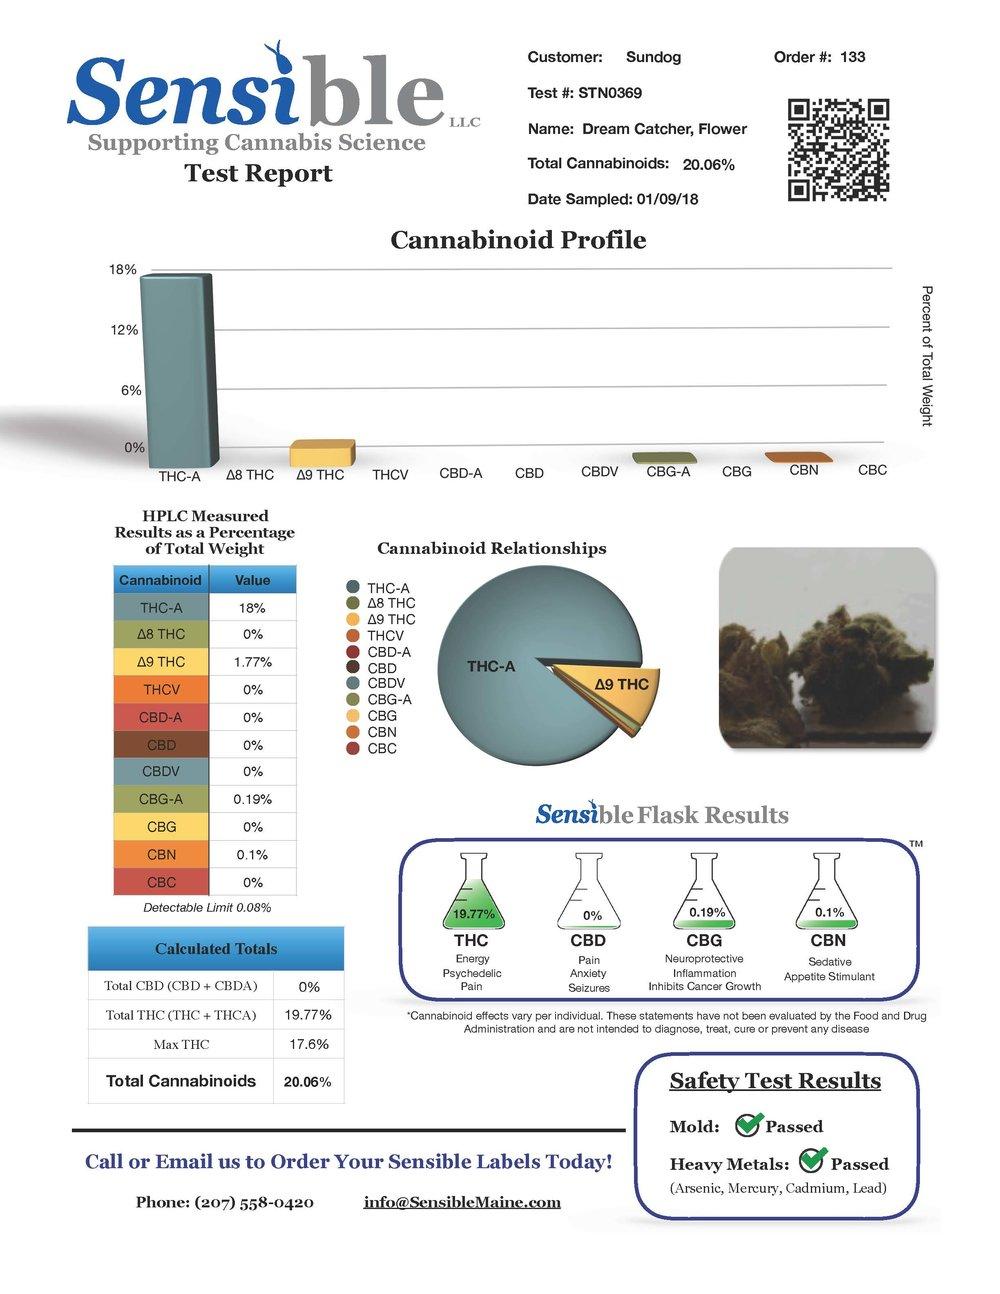 Test Report stn0369.jpg